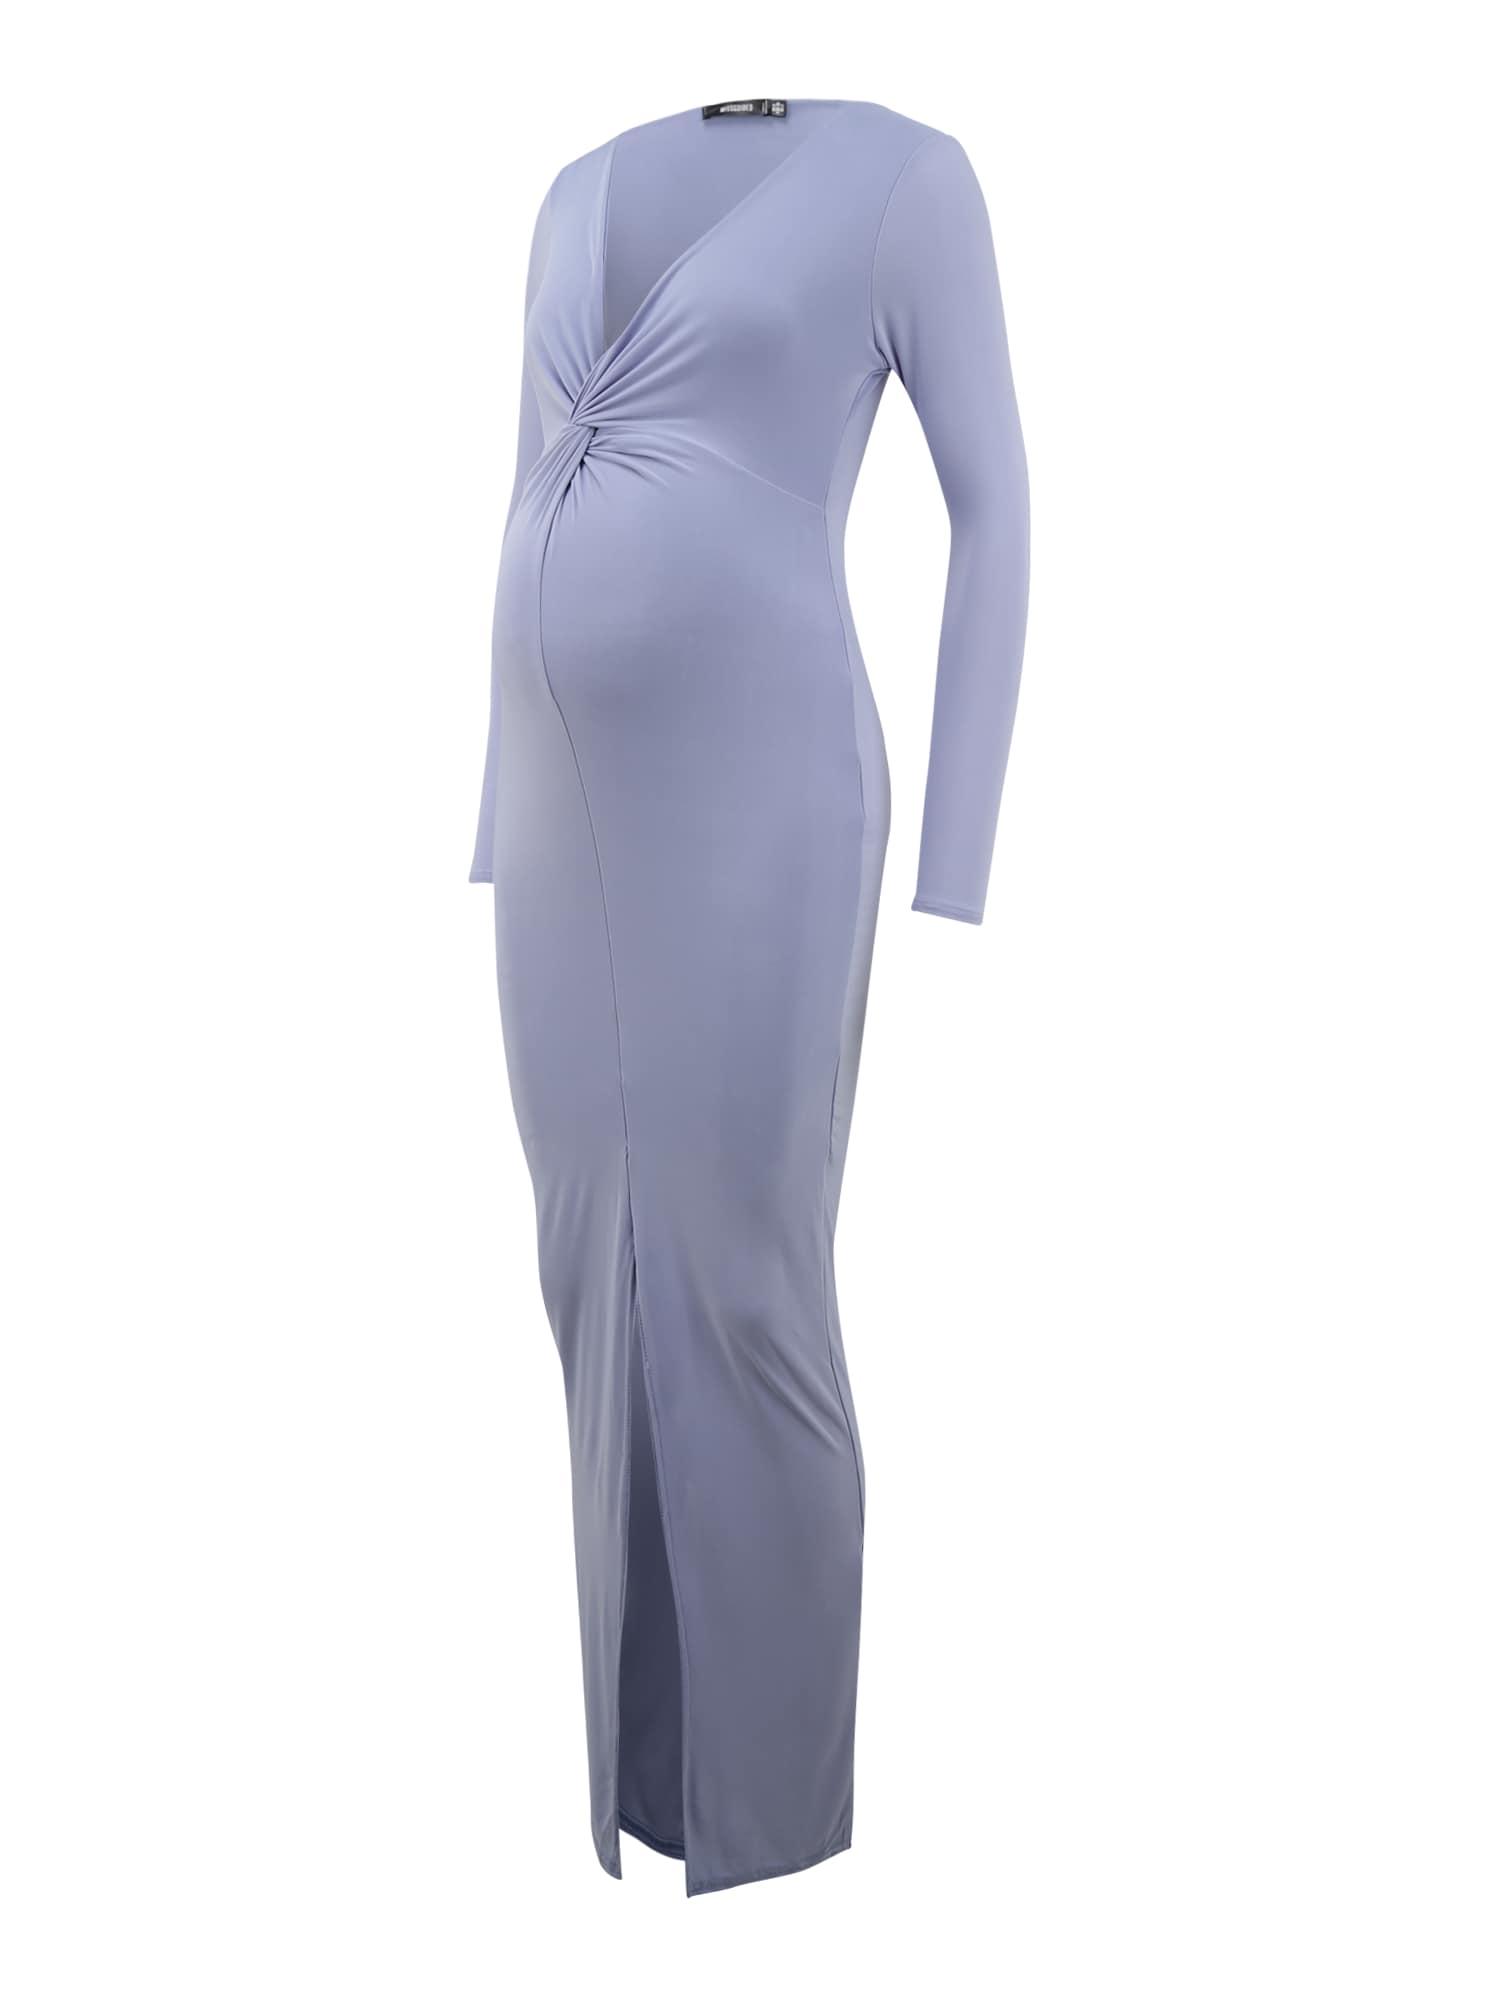 Missguided Maternity Suknelė mėlyna dūmų spalva